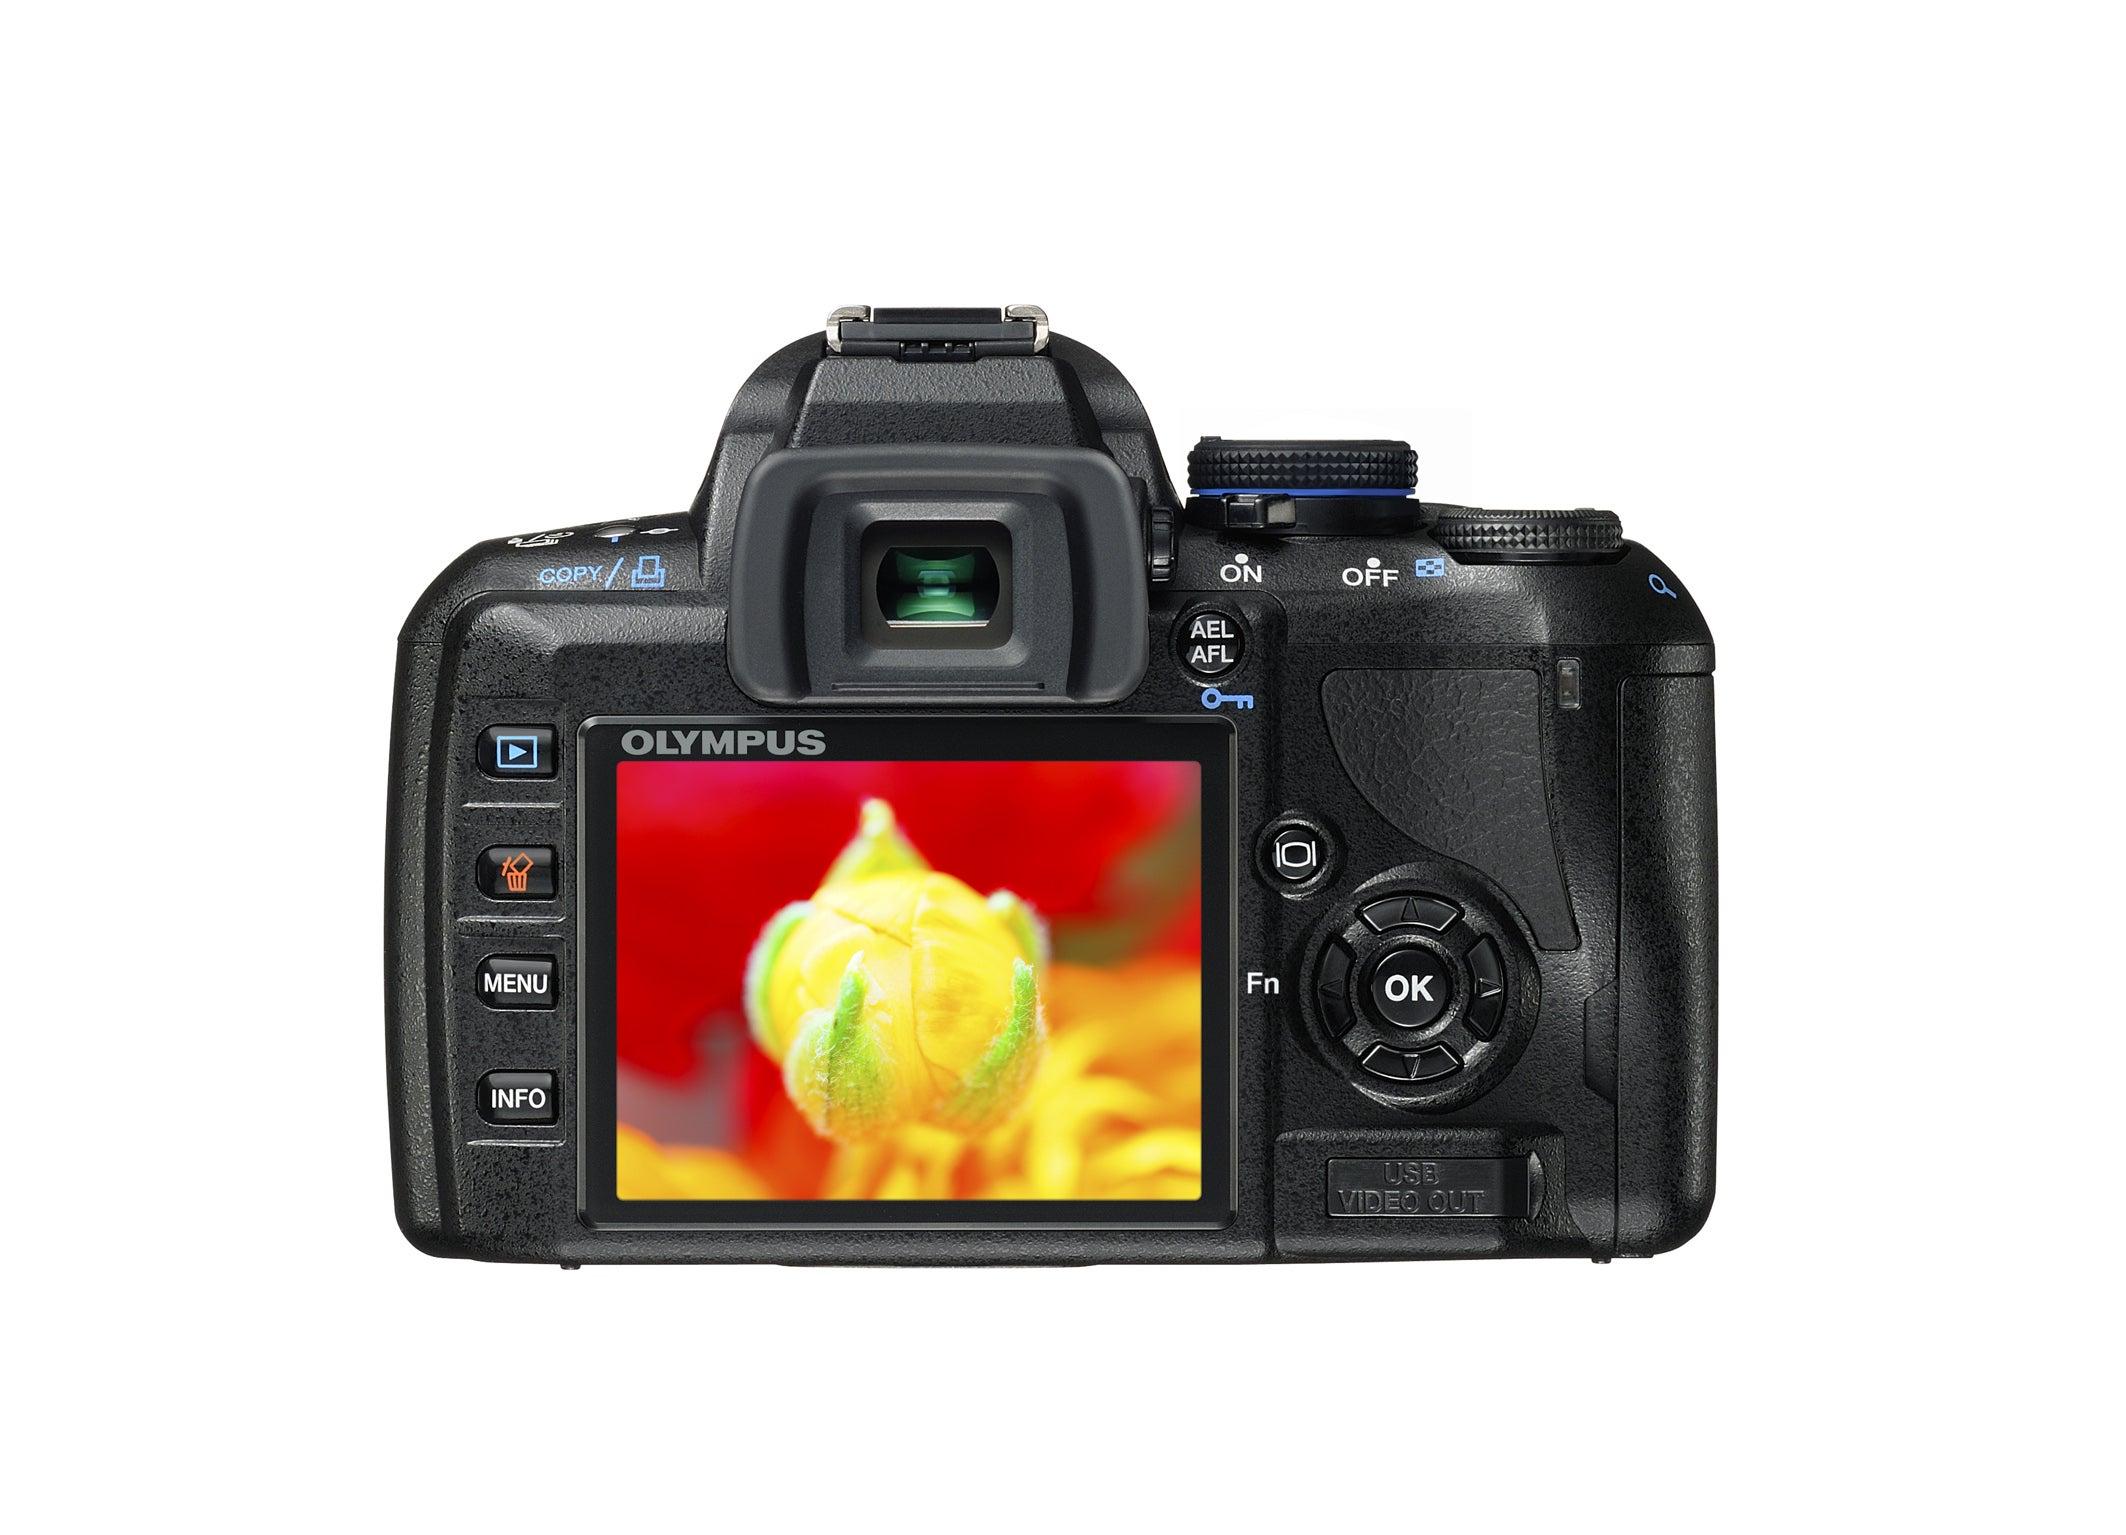 What Digital Camera: Olympus E-450